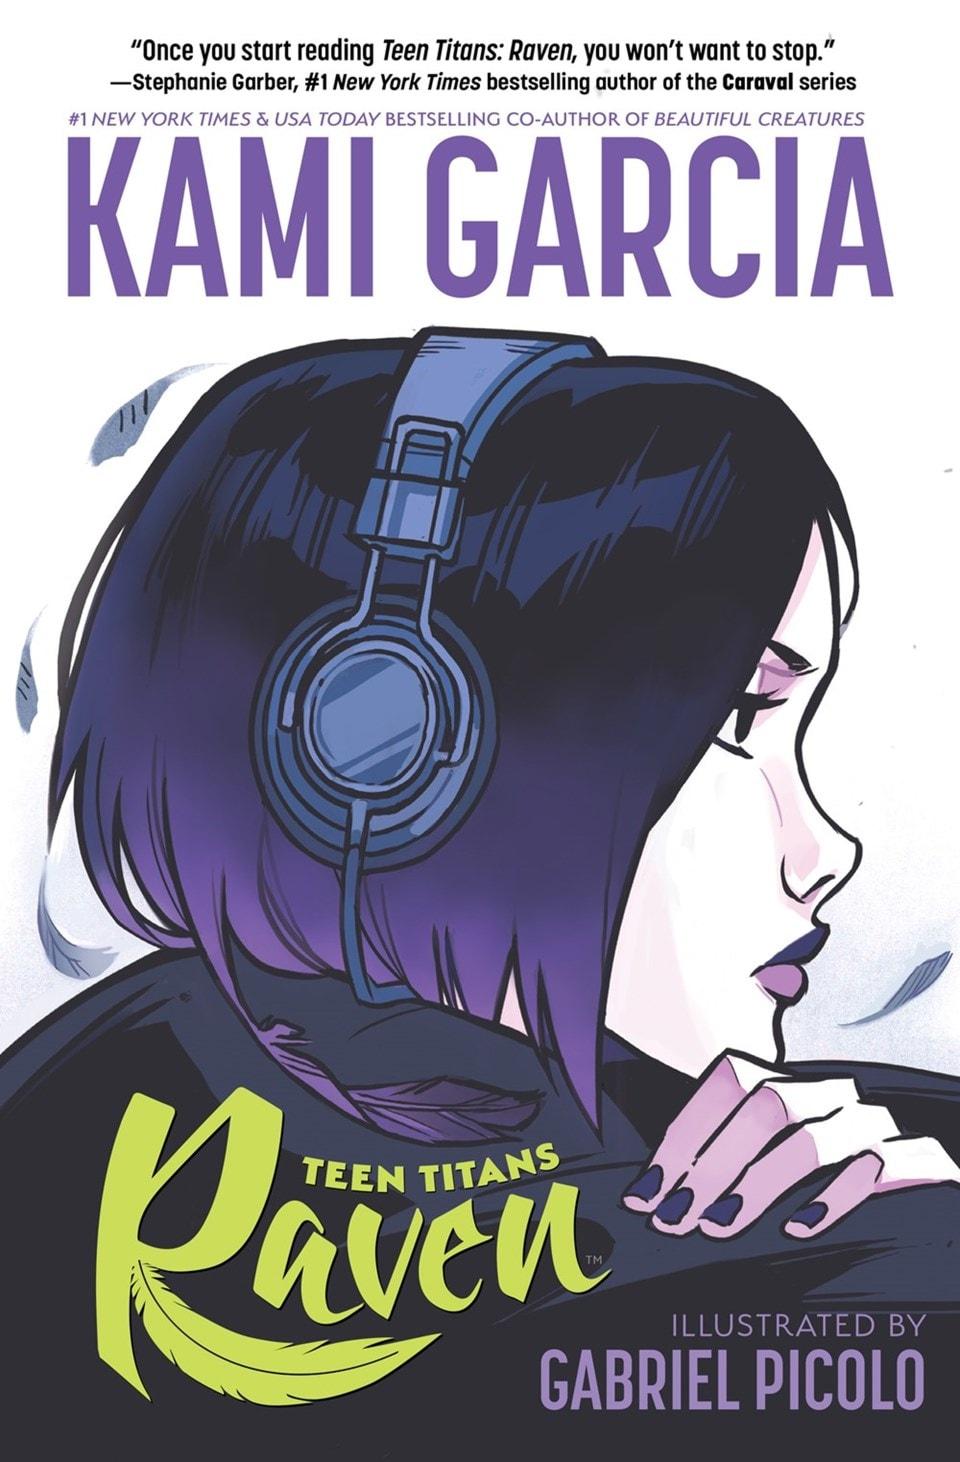 Teen Titans: Raven - 1